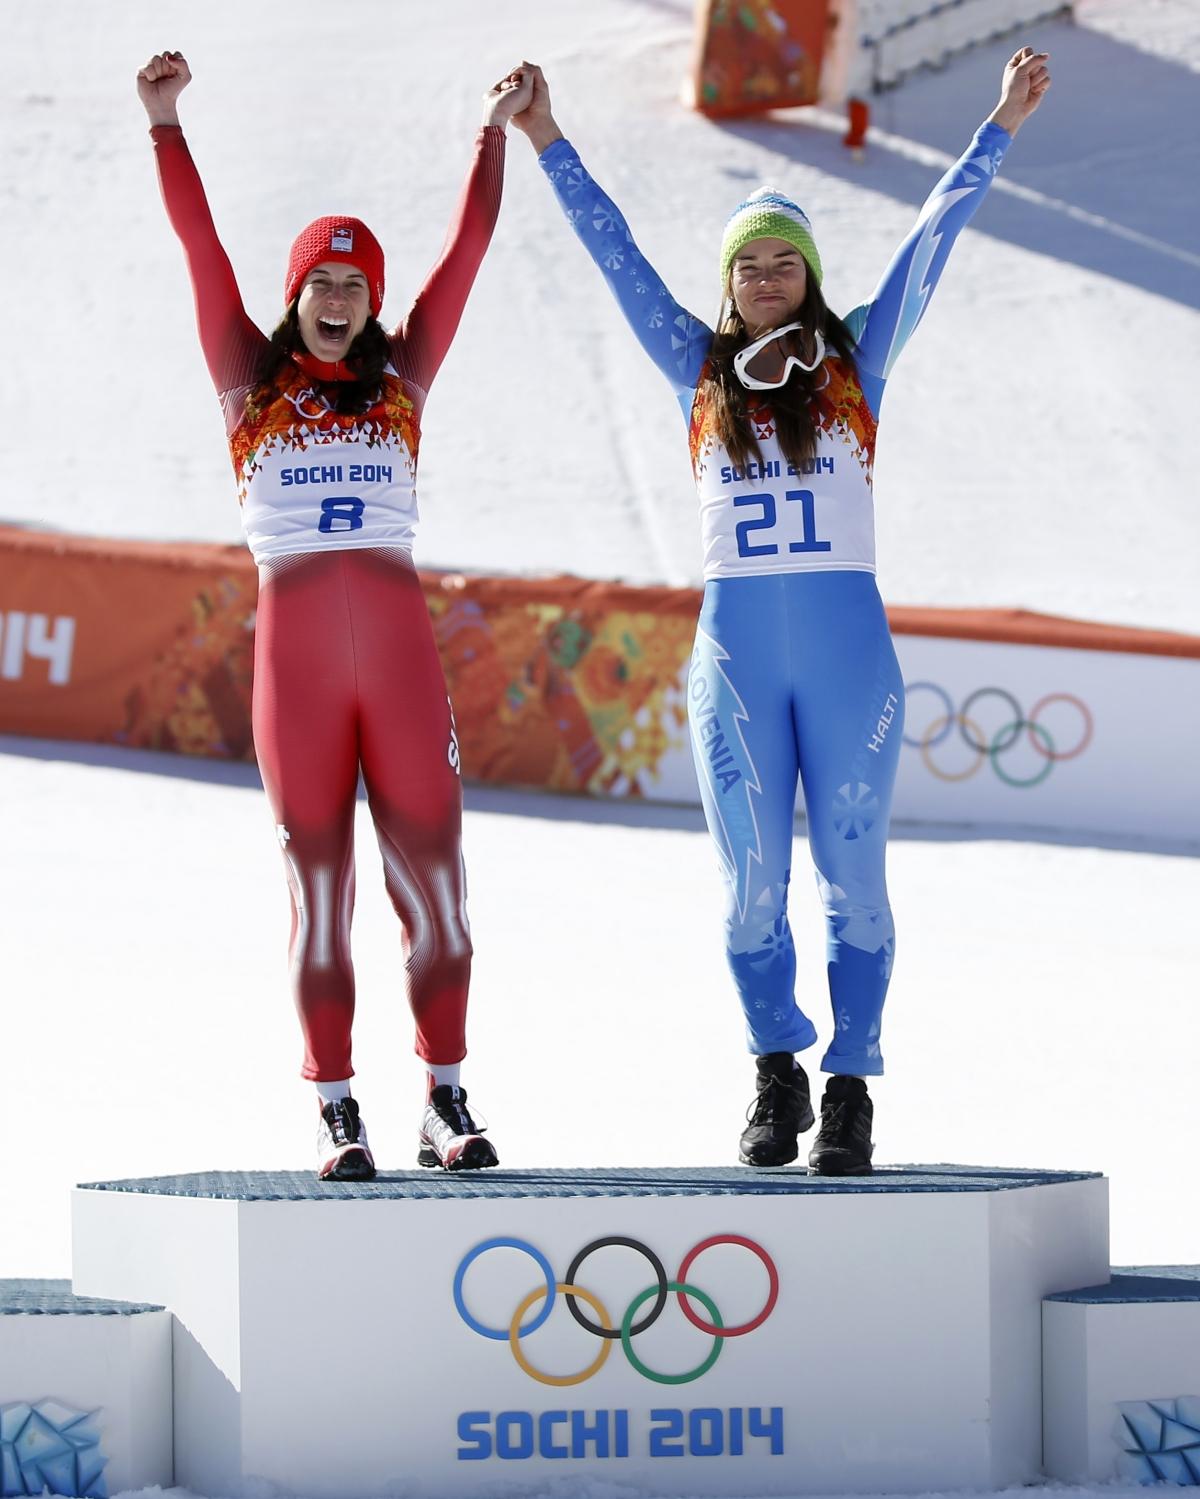 Tina Maze and Dominique Gisin